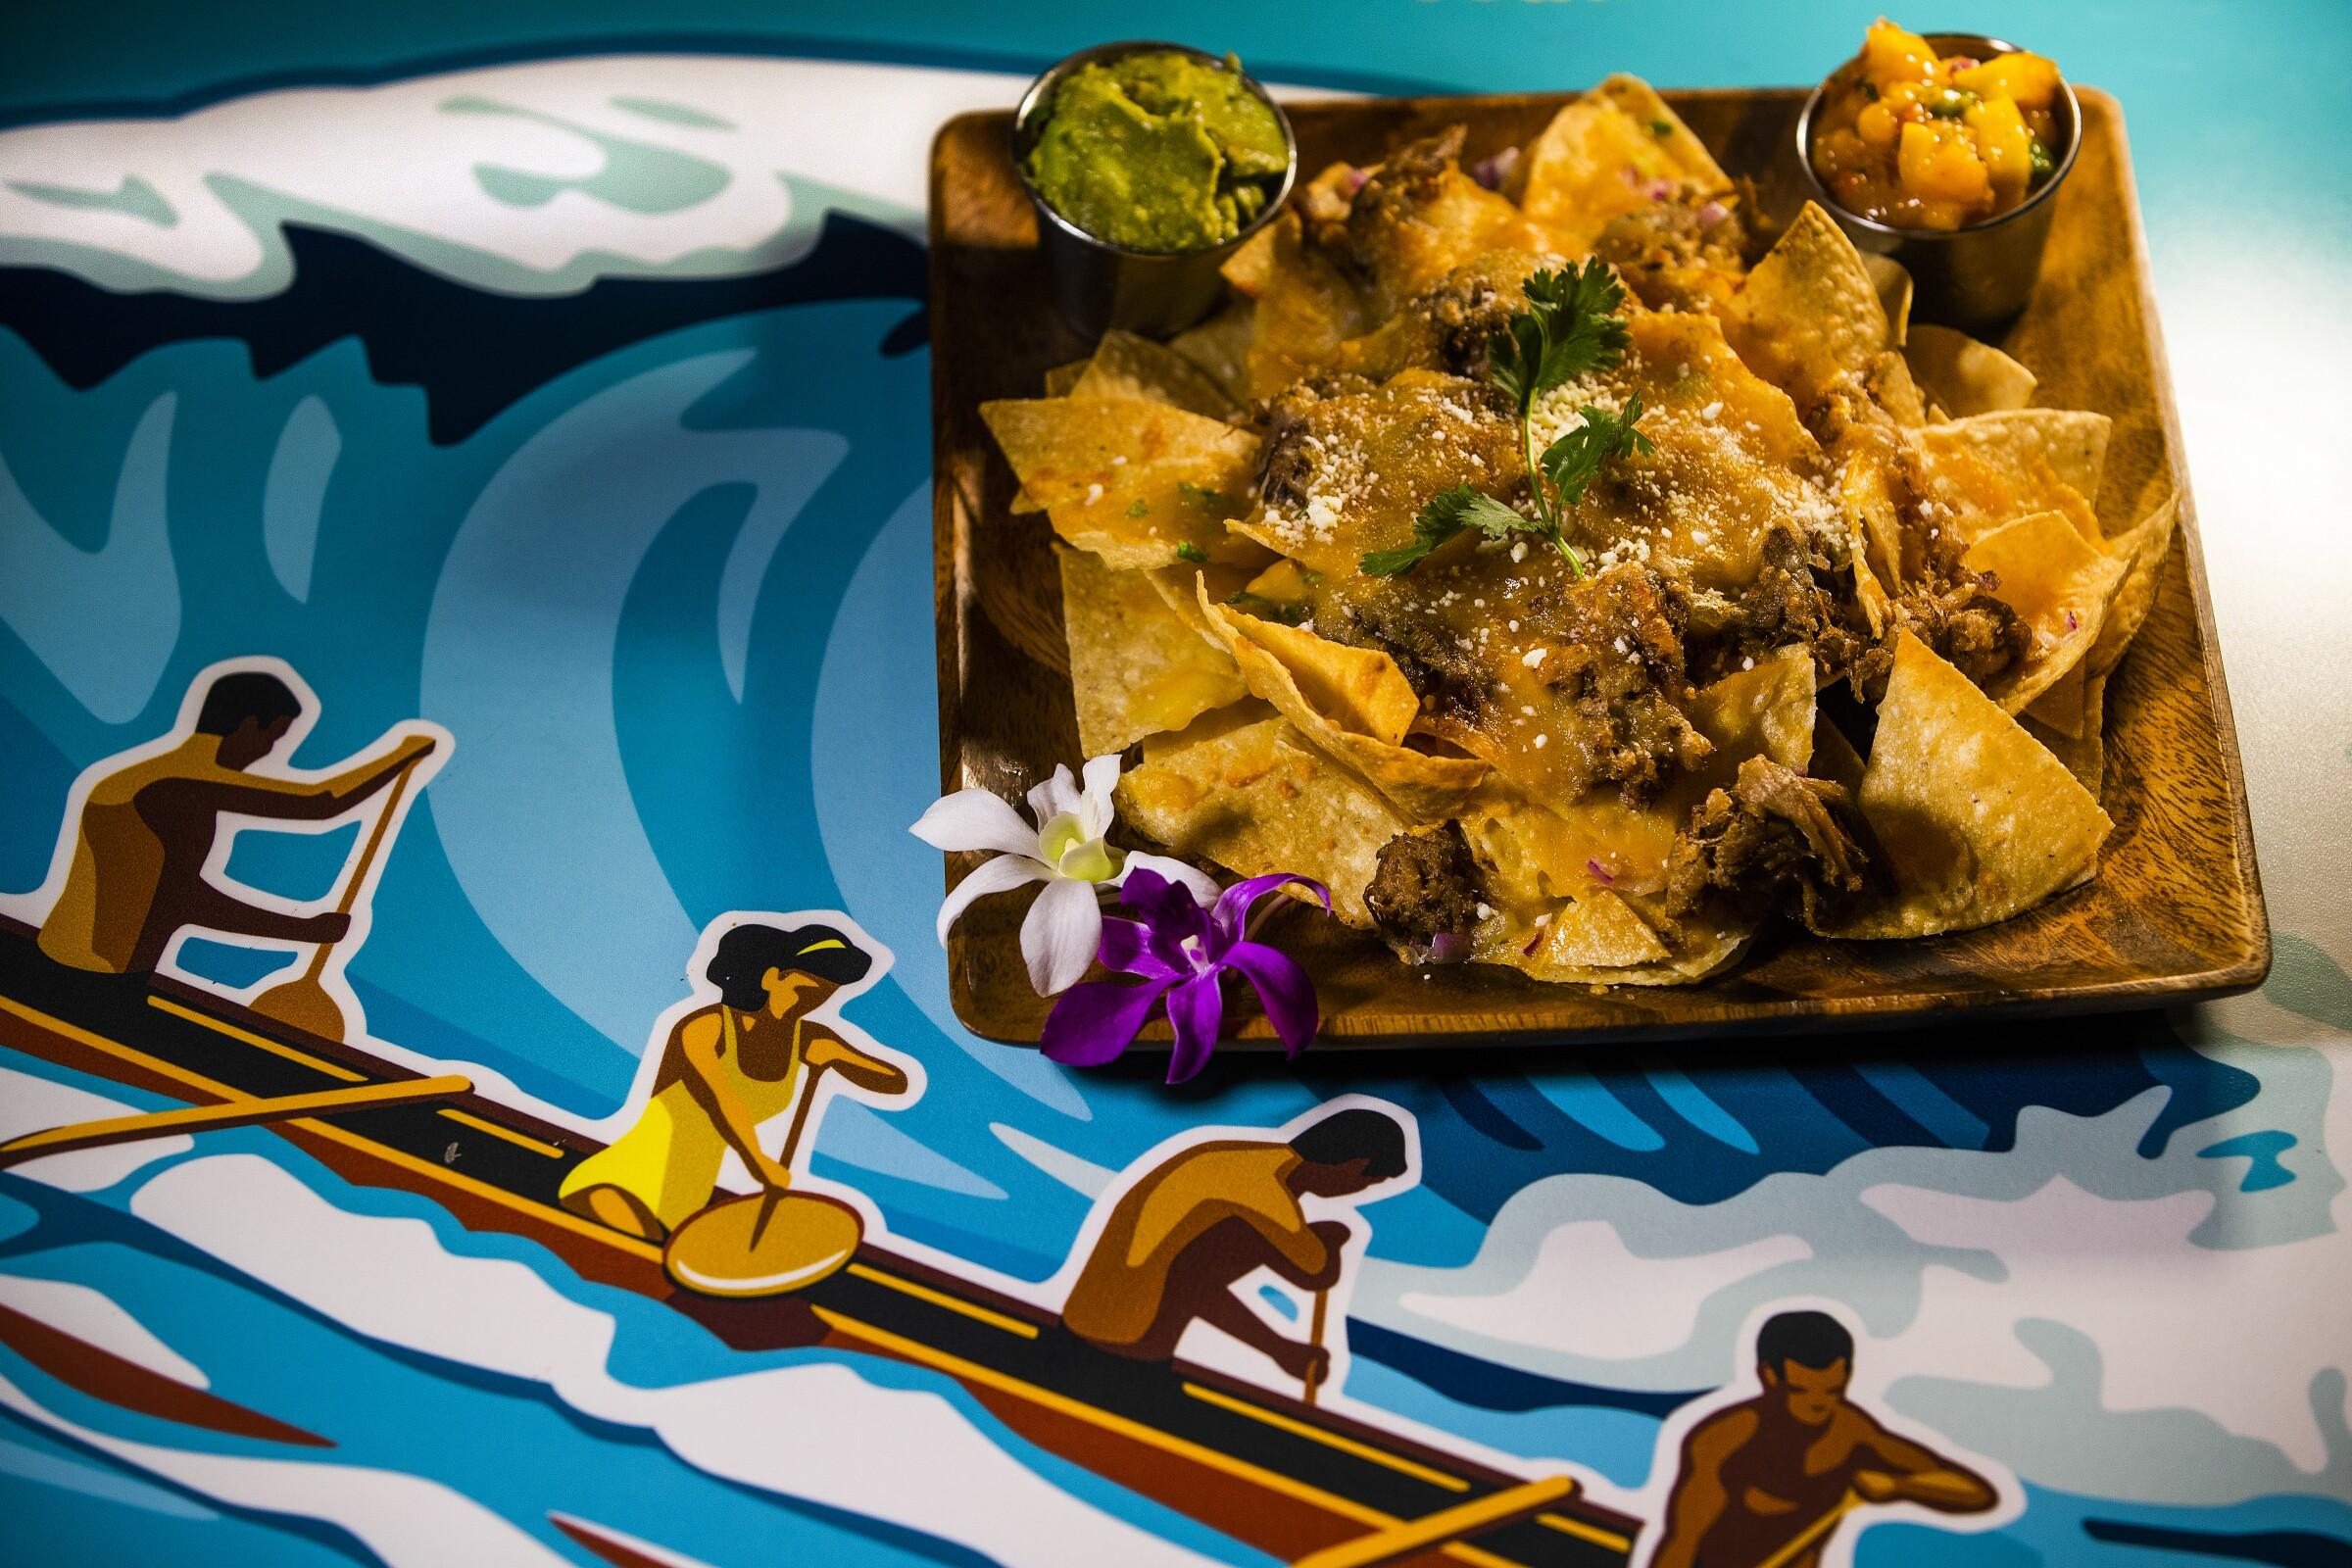 Kalua pork nachos, $19, are on the menu at Kona Tap Room, inside the Hilton Waikoloa Village in Waikoloa Village, Hawaii.